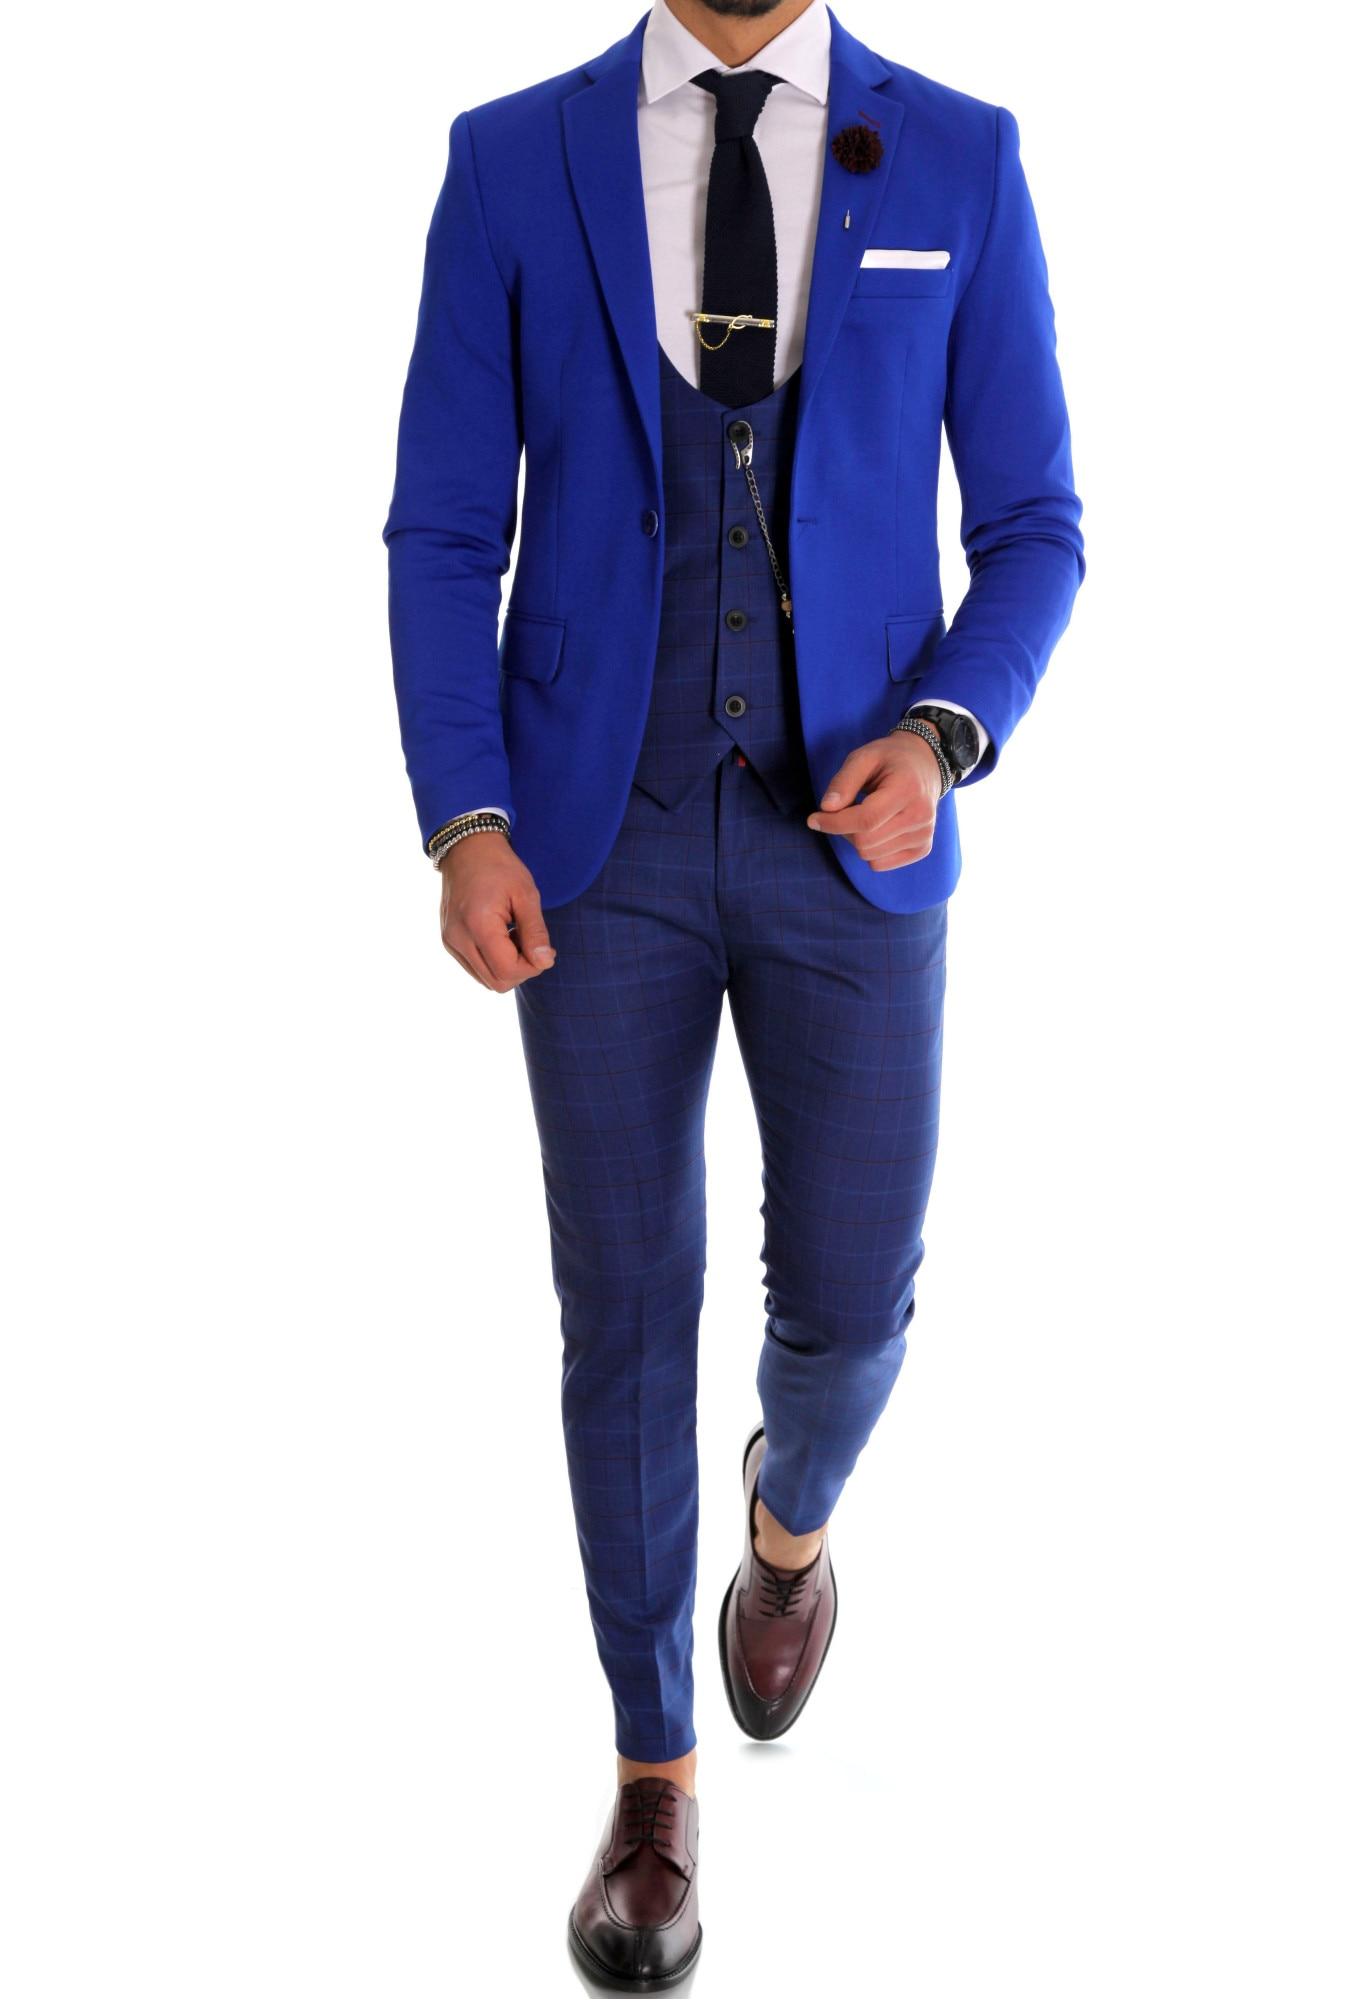 Costum office, albastru, sacou, vesta, pantaloni, elegant, slim fit, pentru  barbati, 48 - eMAG.ro